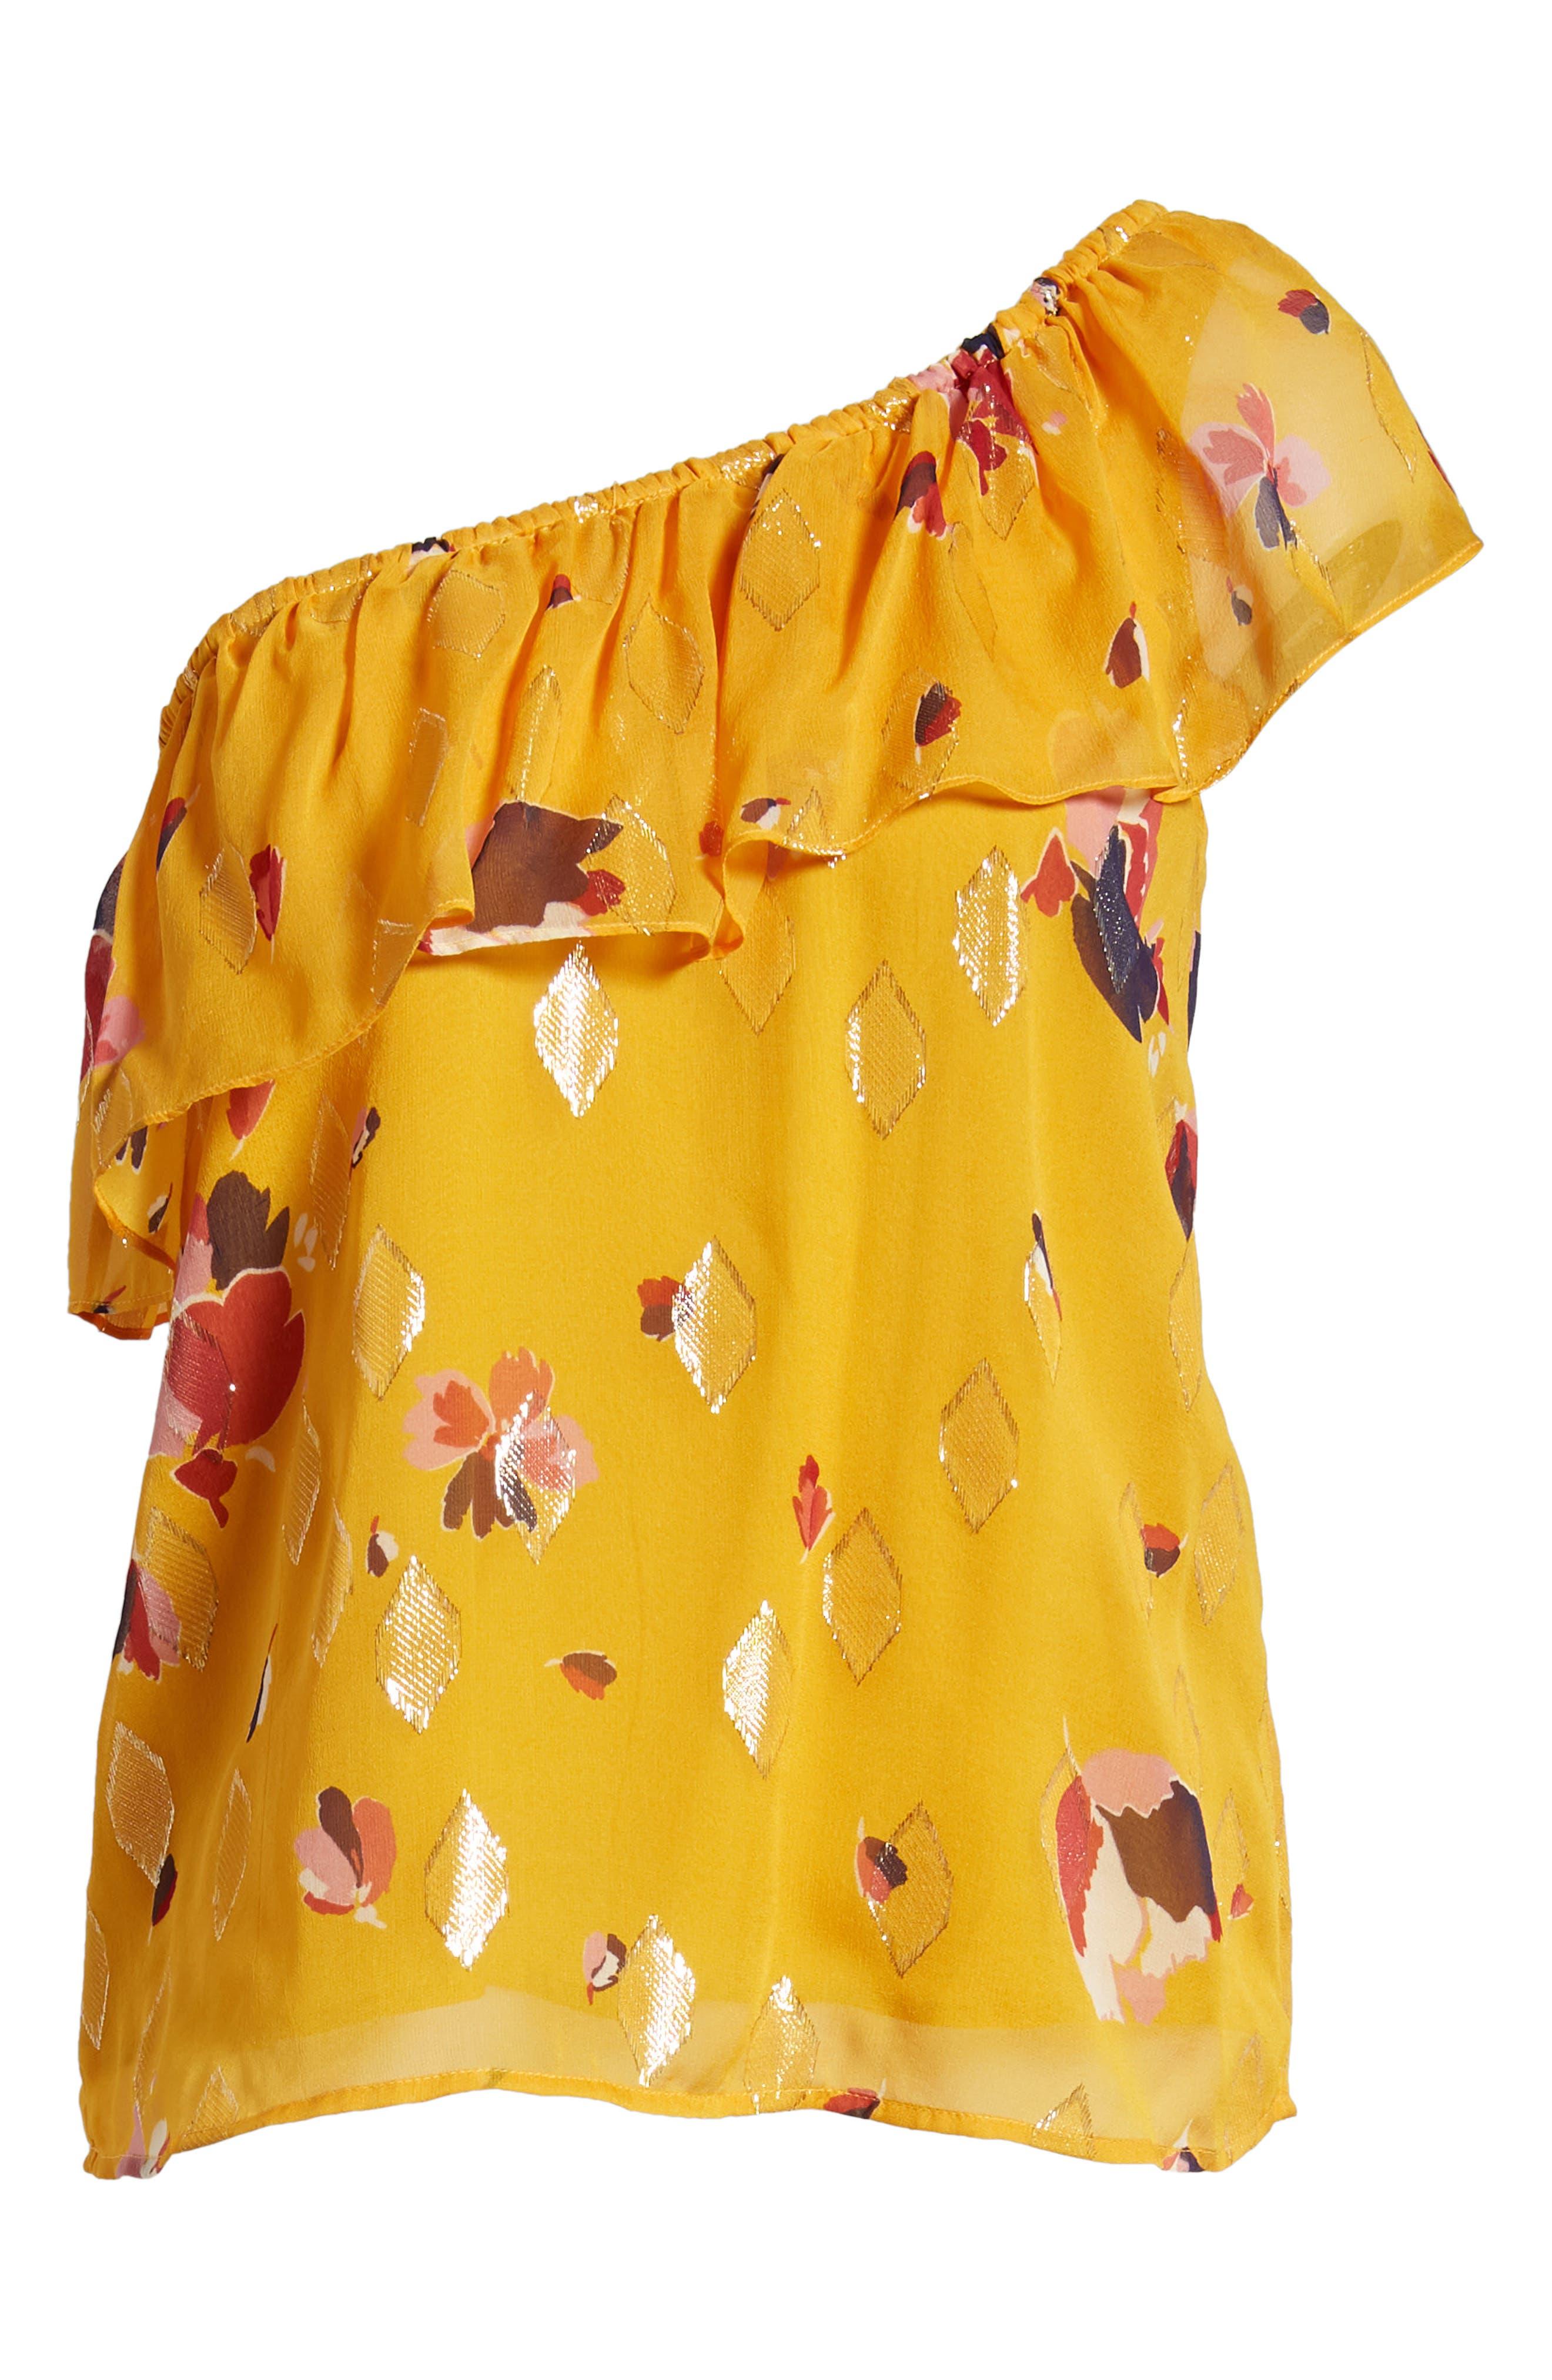 Adelie Ruffle One-Shoulder Metallic Silk Blouse,                             Alternate thumbnail 6, color,                             Big Flowers 60S On Saffron